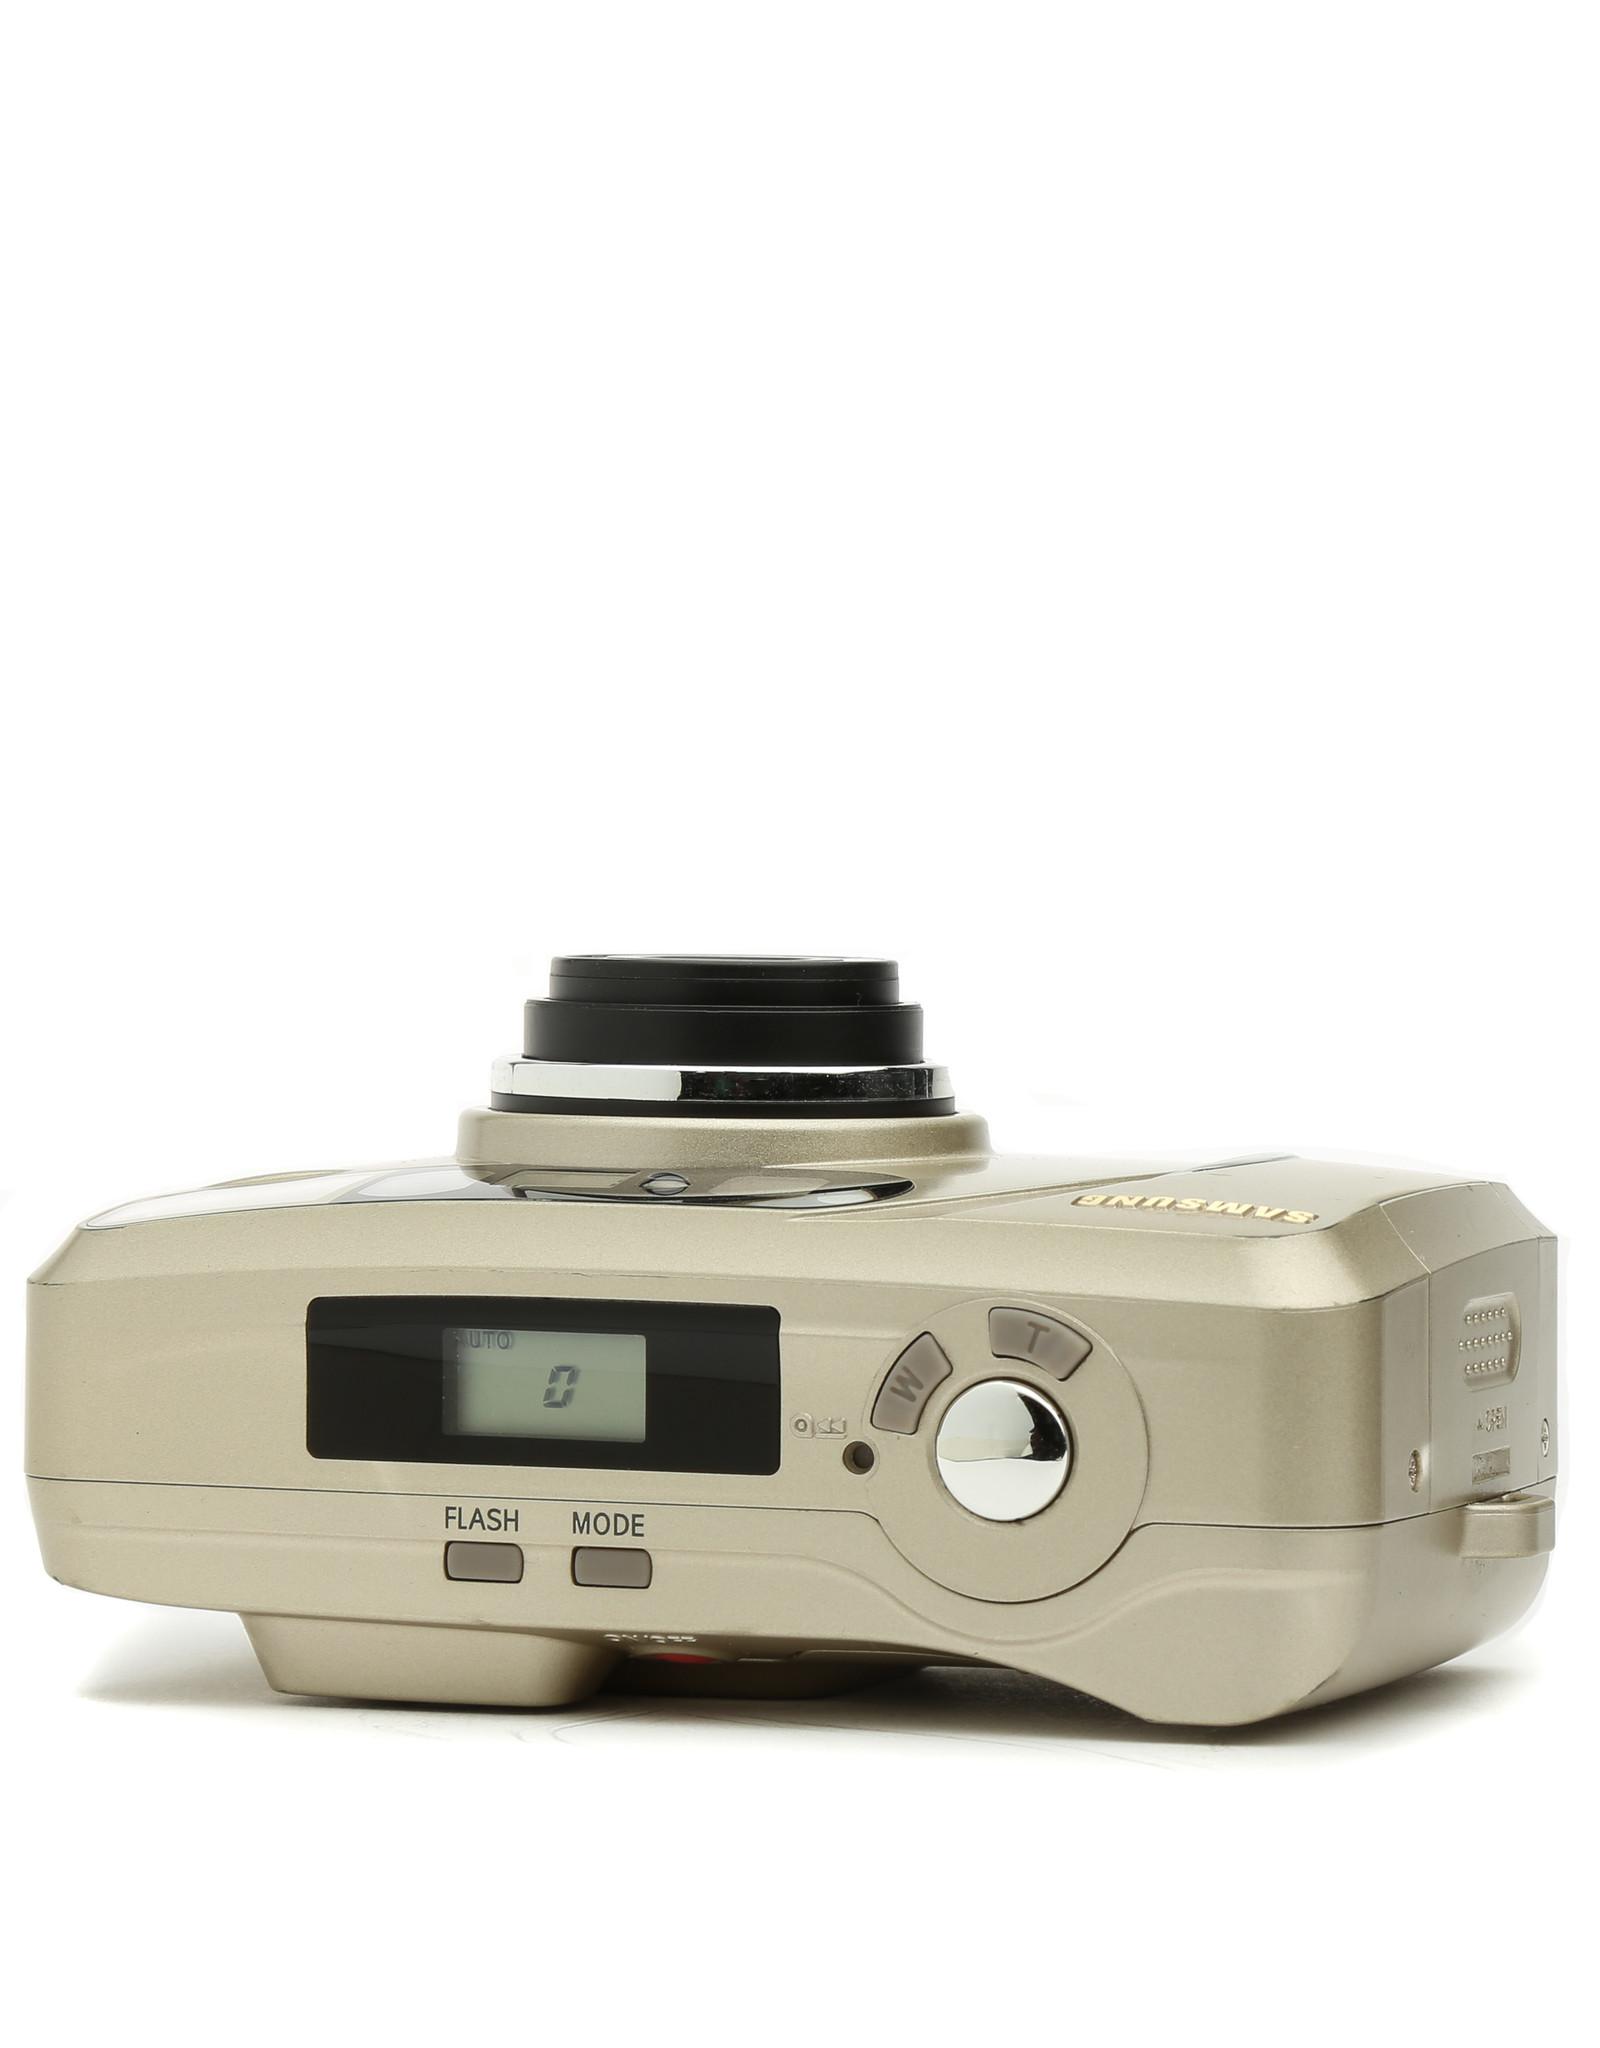 Samsung SAMSUNG MAXIMA 105GL 35mm CAMERA